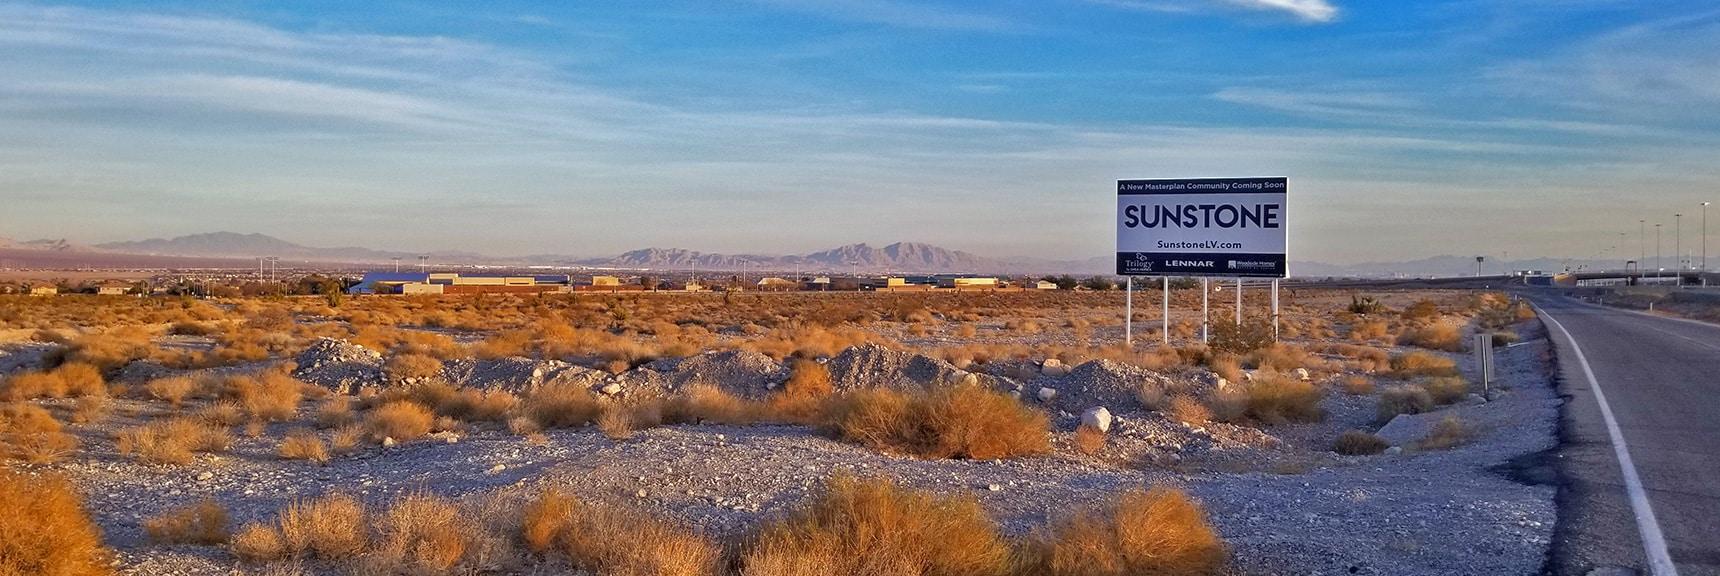 Sunstone Estates Just Before Development | Snapshot of Las Vegas Northern Growth Edge on January 3, 2021